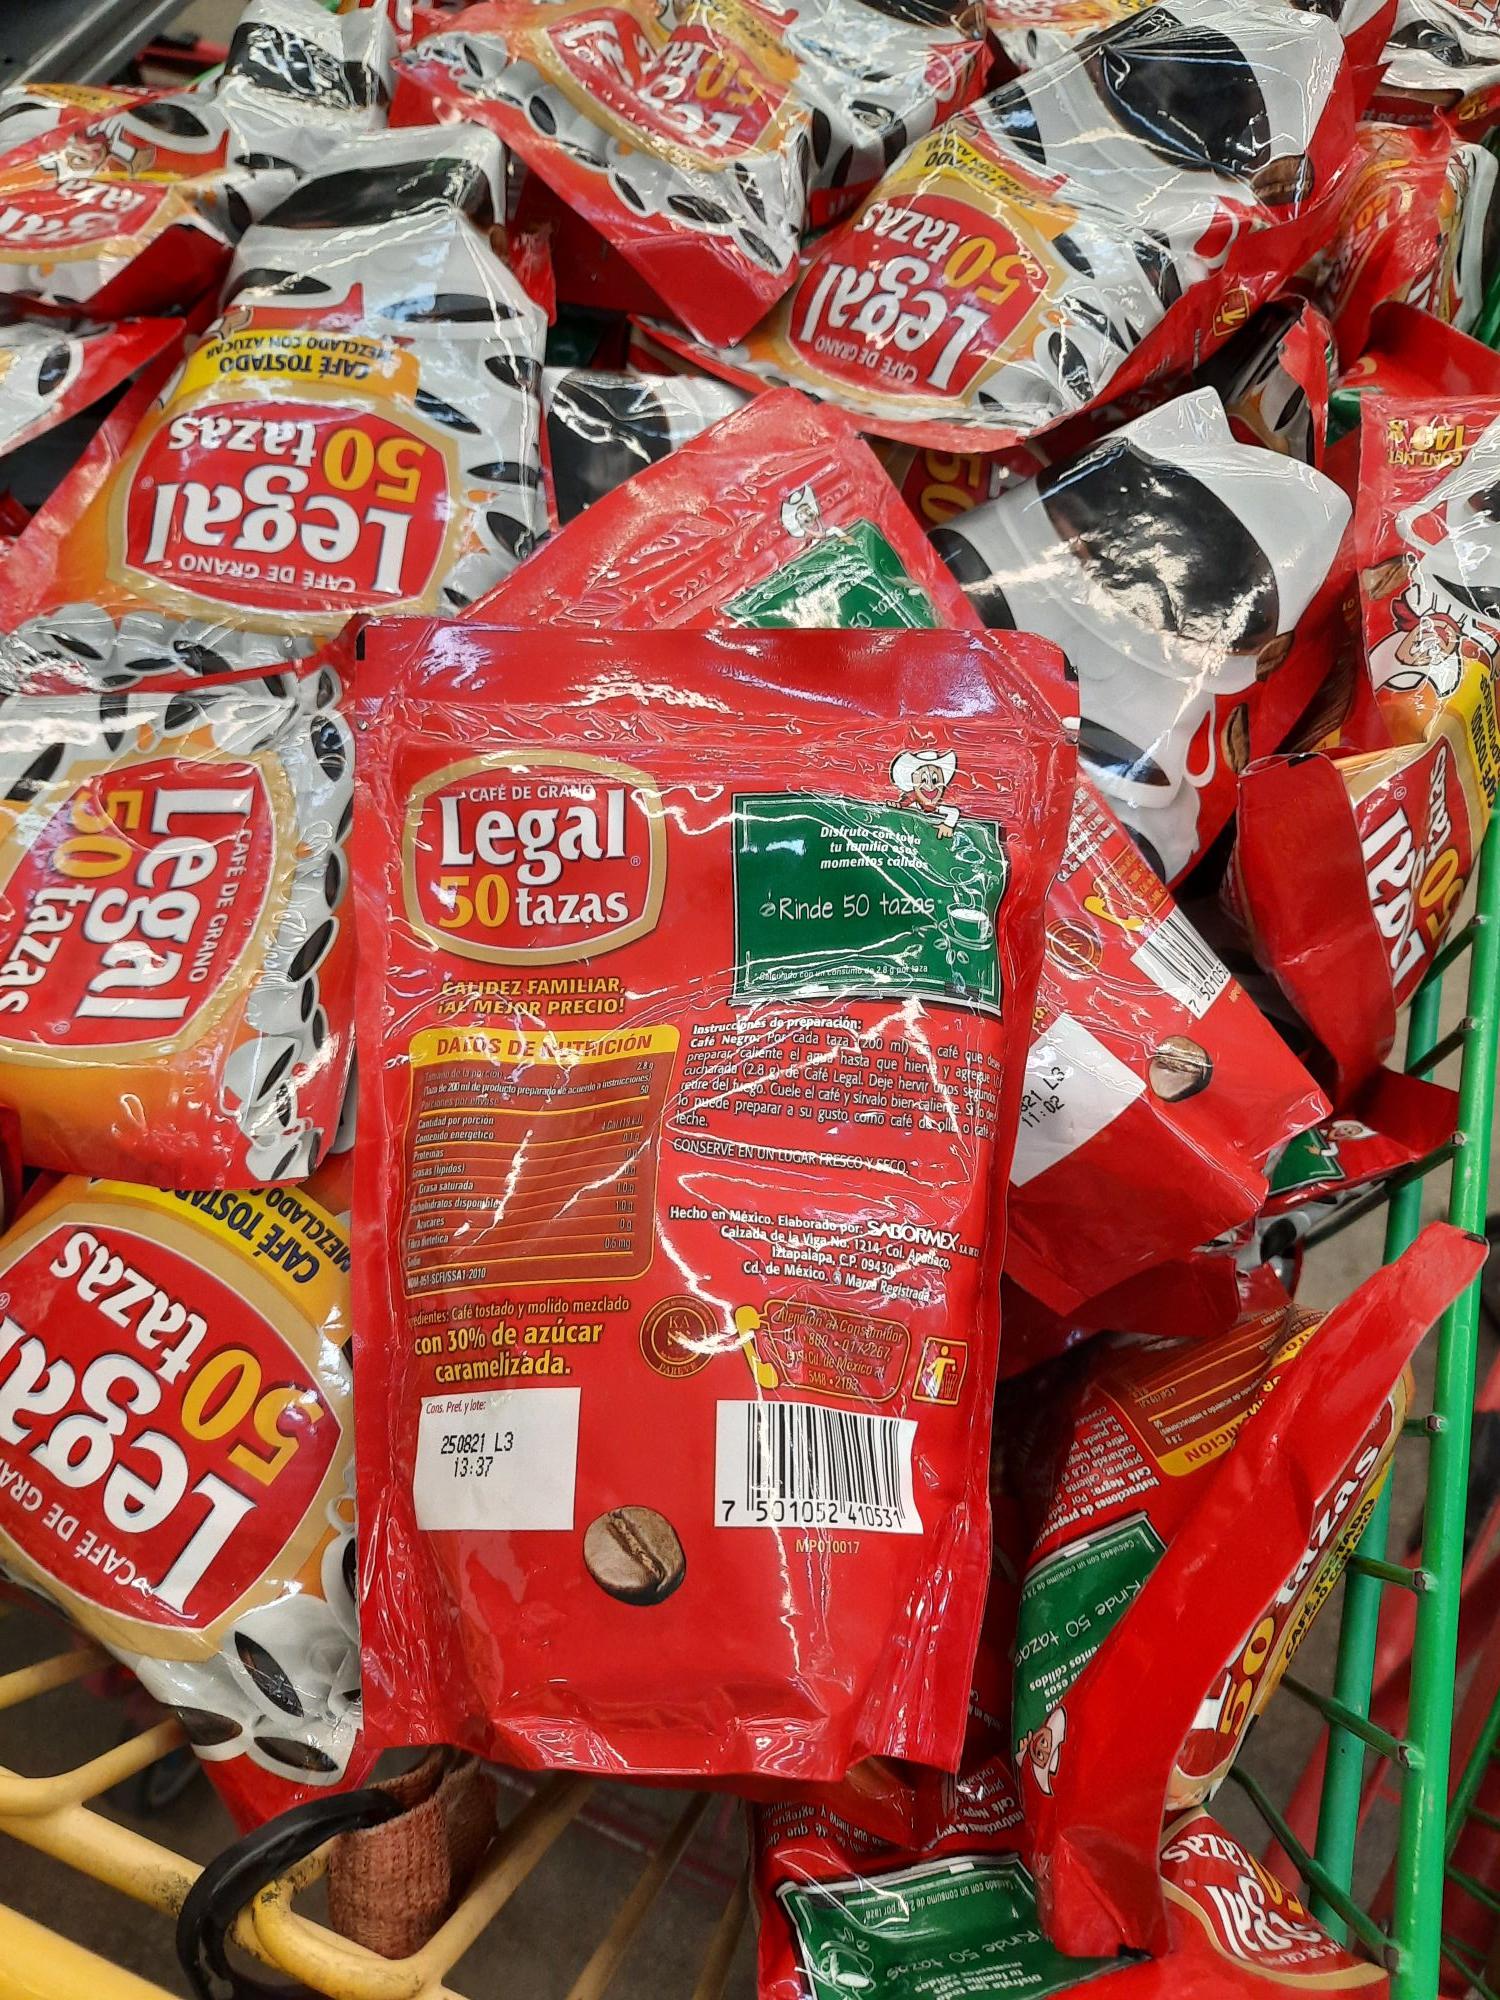 Bodega Aurrera: Cafe legal de grano